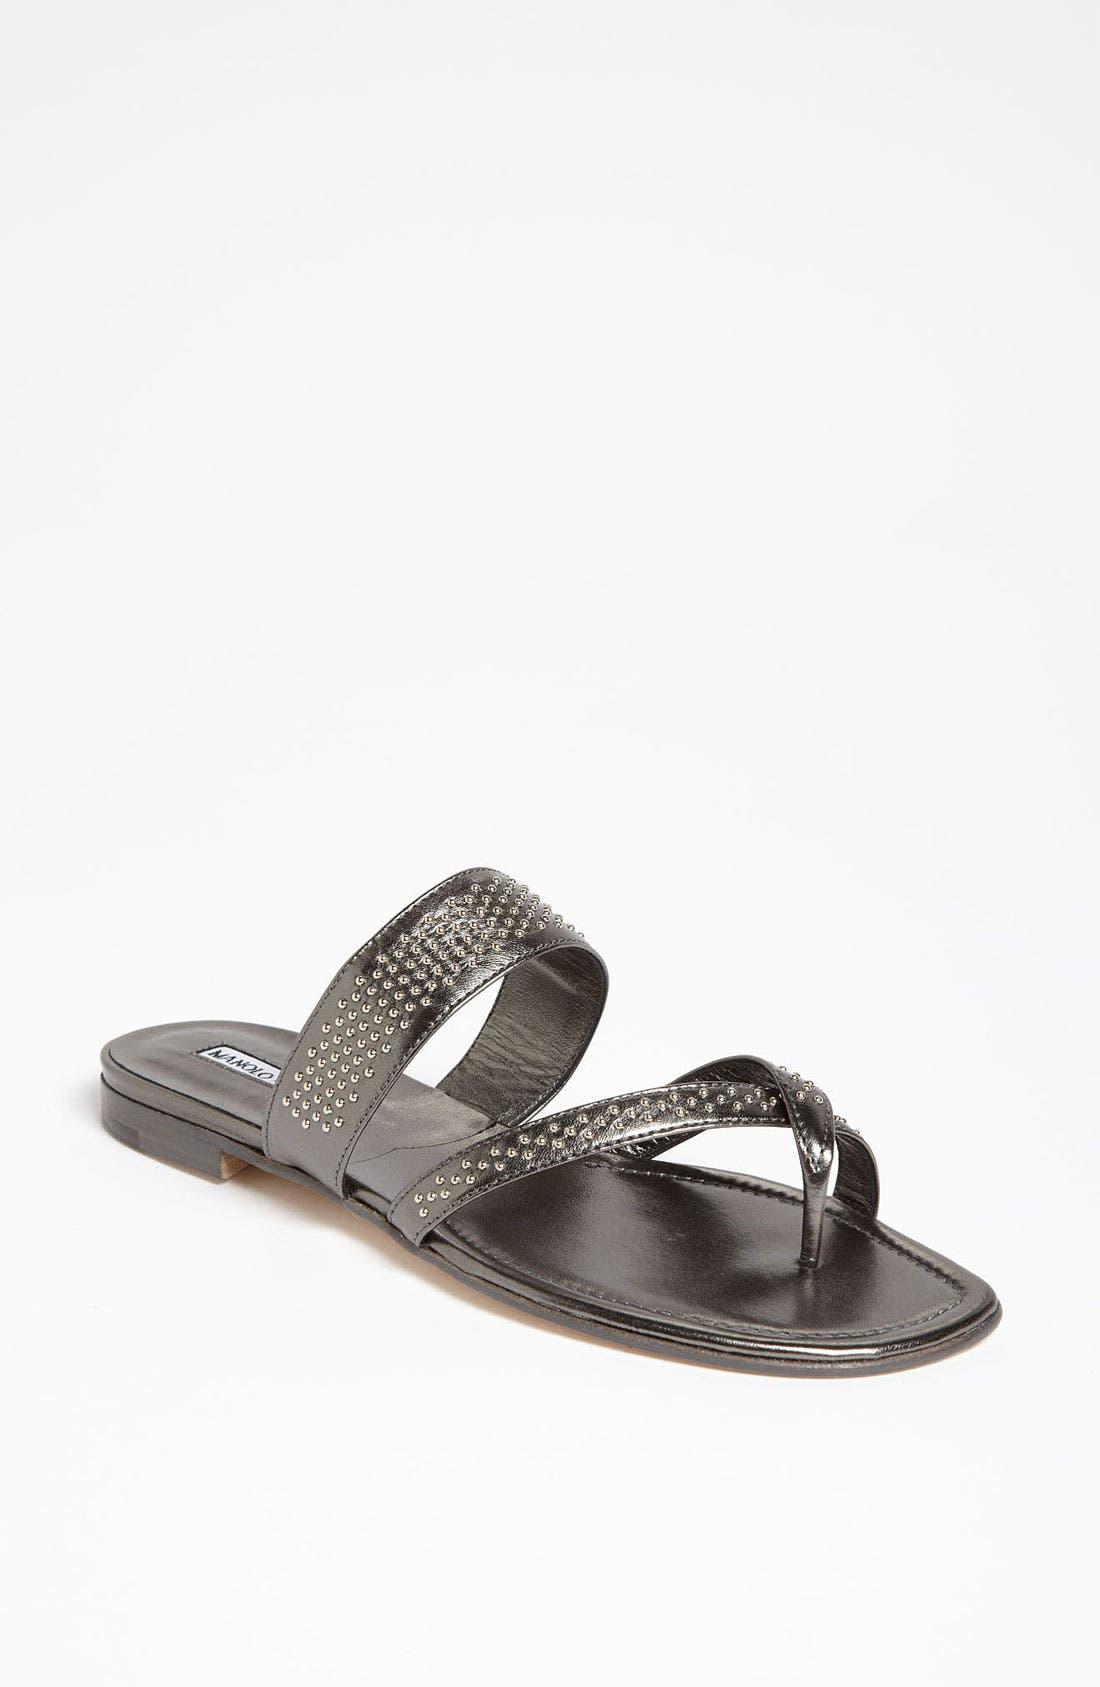 Main Image - Manolo Blahnik 'Susabor' Sandal